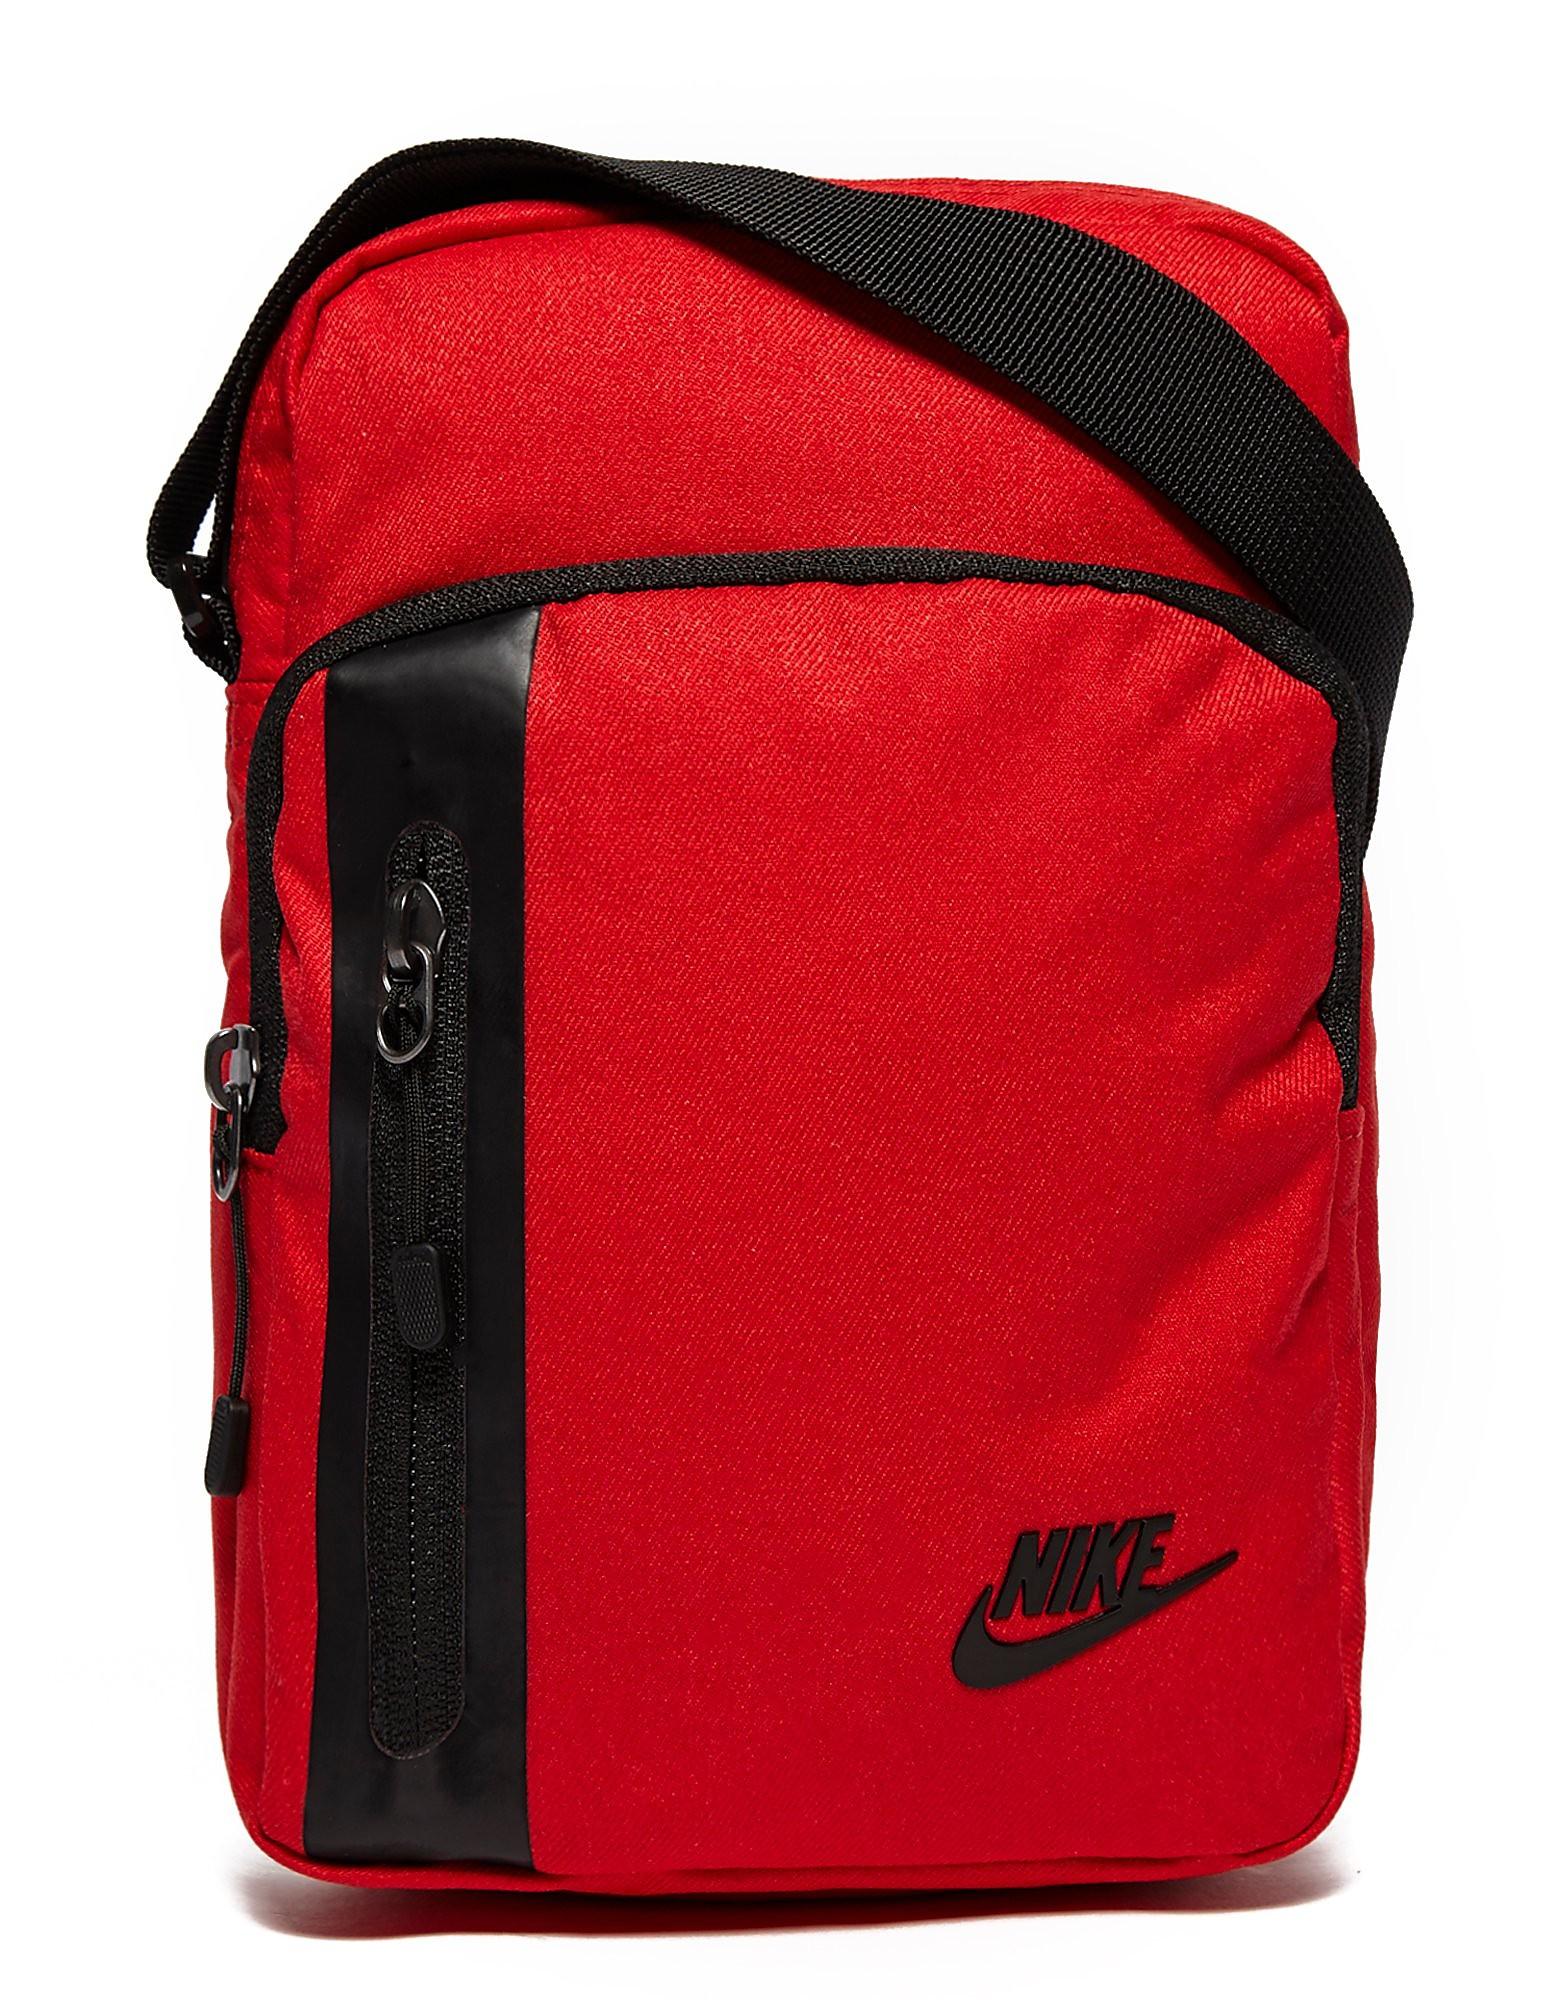 Nike Sac Core Small Items3.0